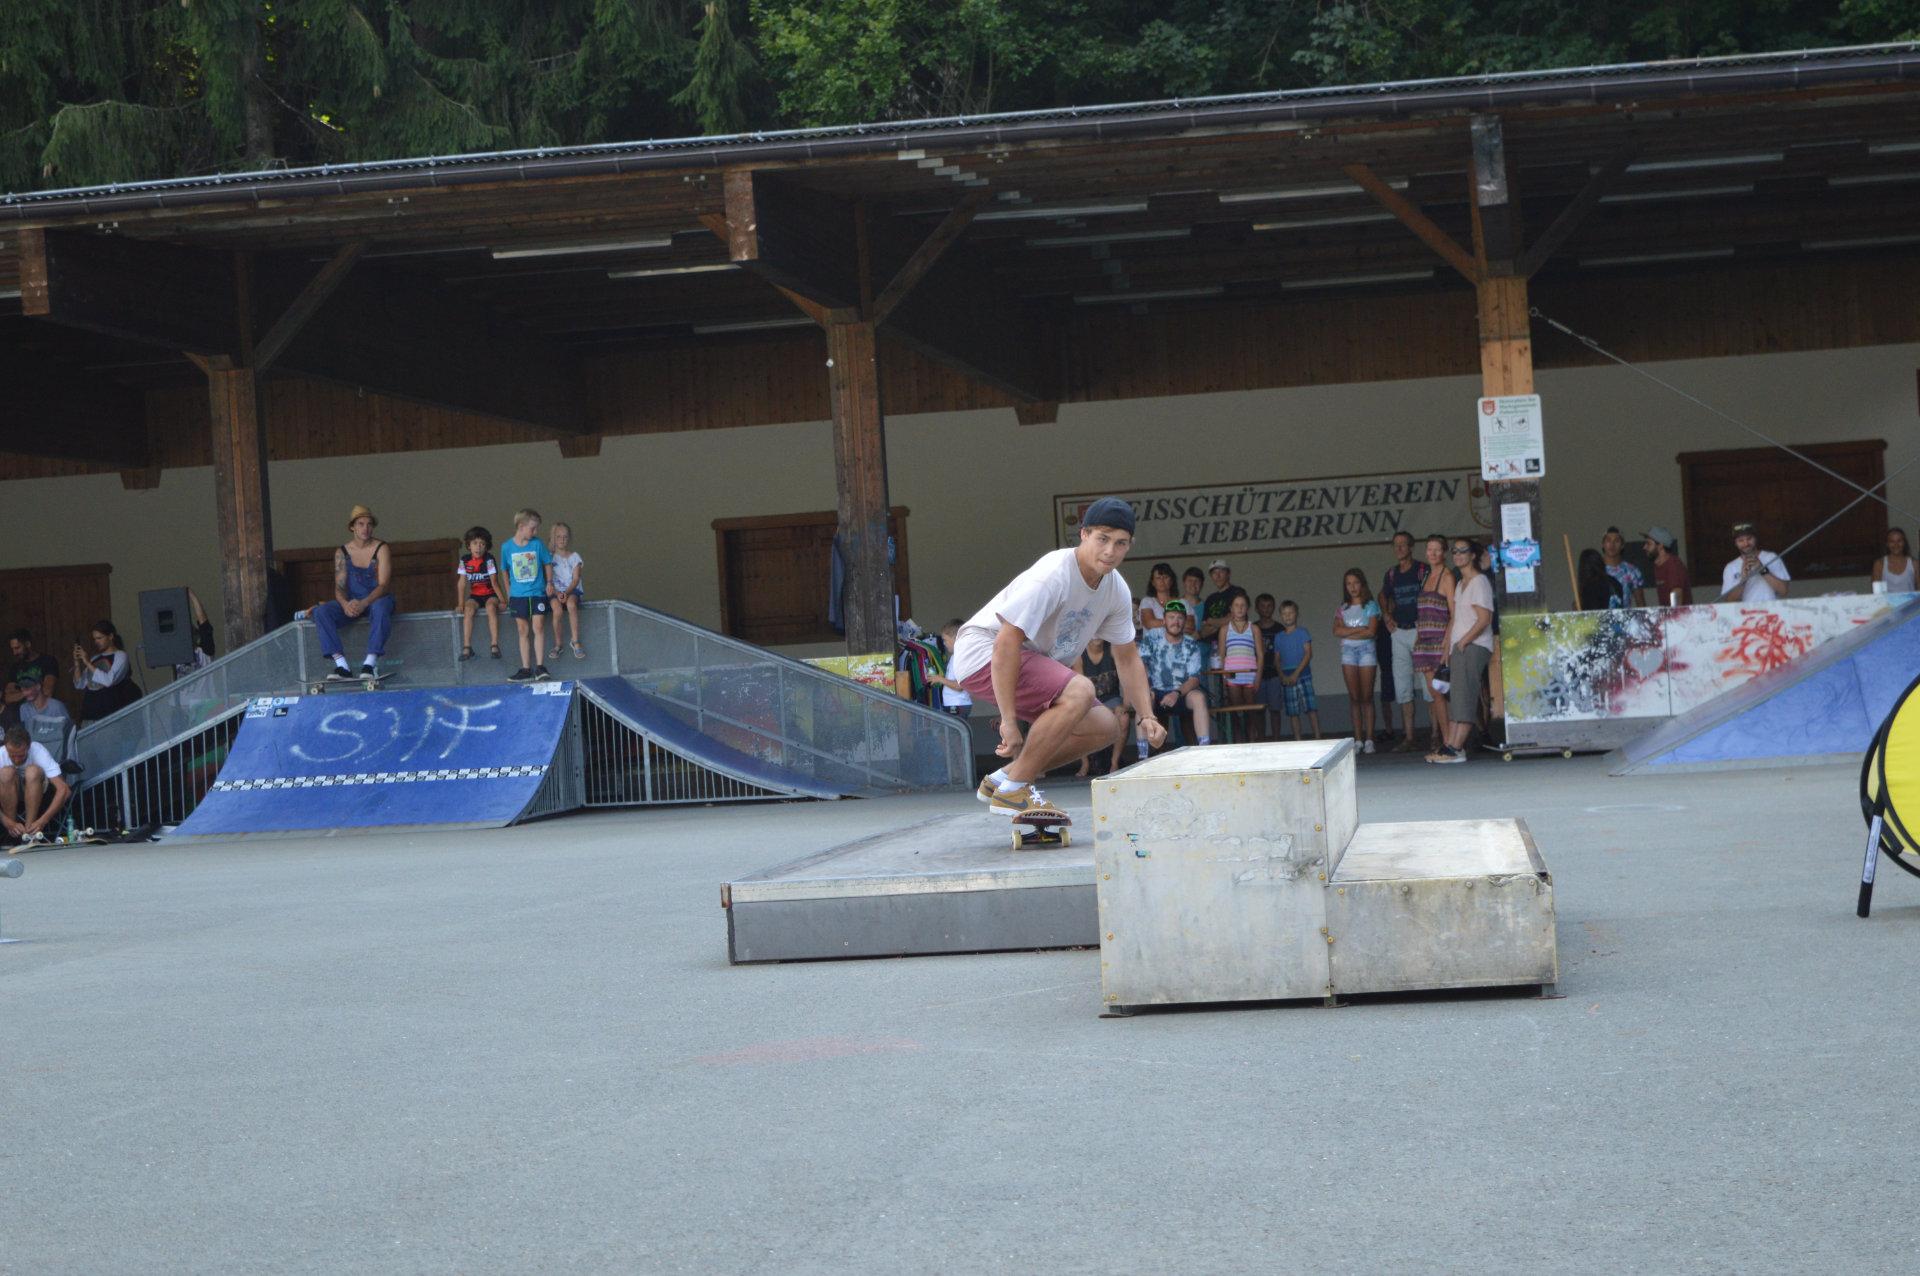 skateboardheadz fieberbrunn kitzgau trophy finale 2018 fieberbrunn 00123